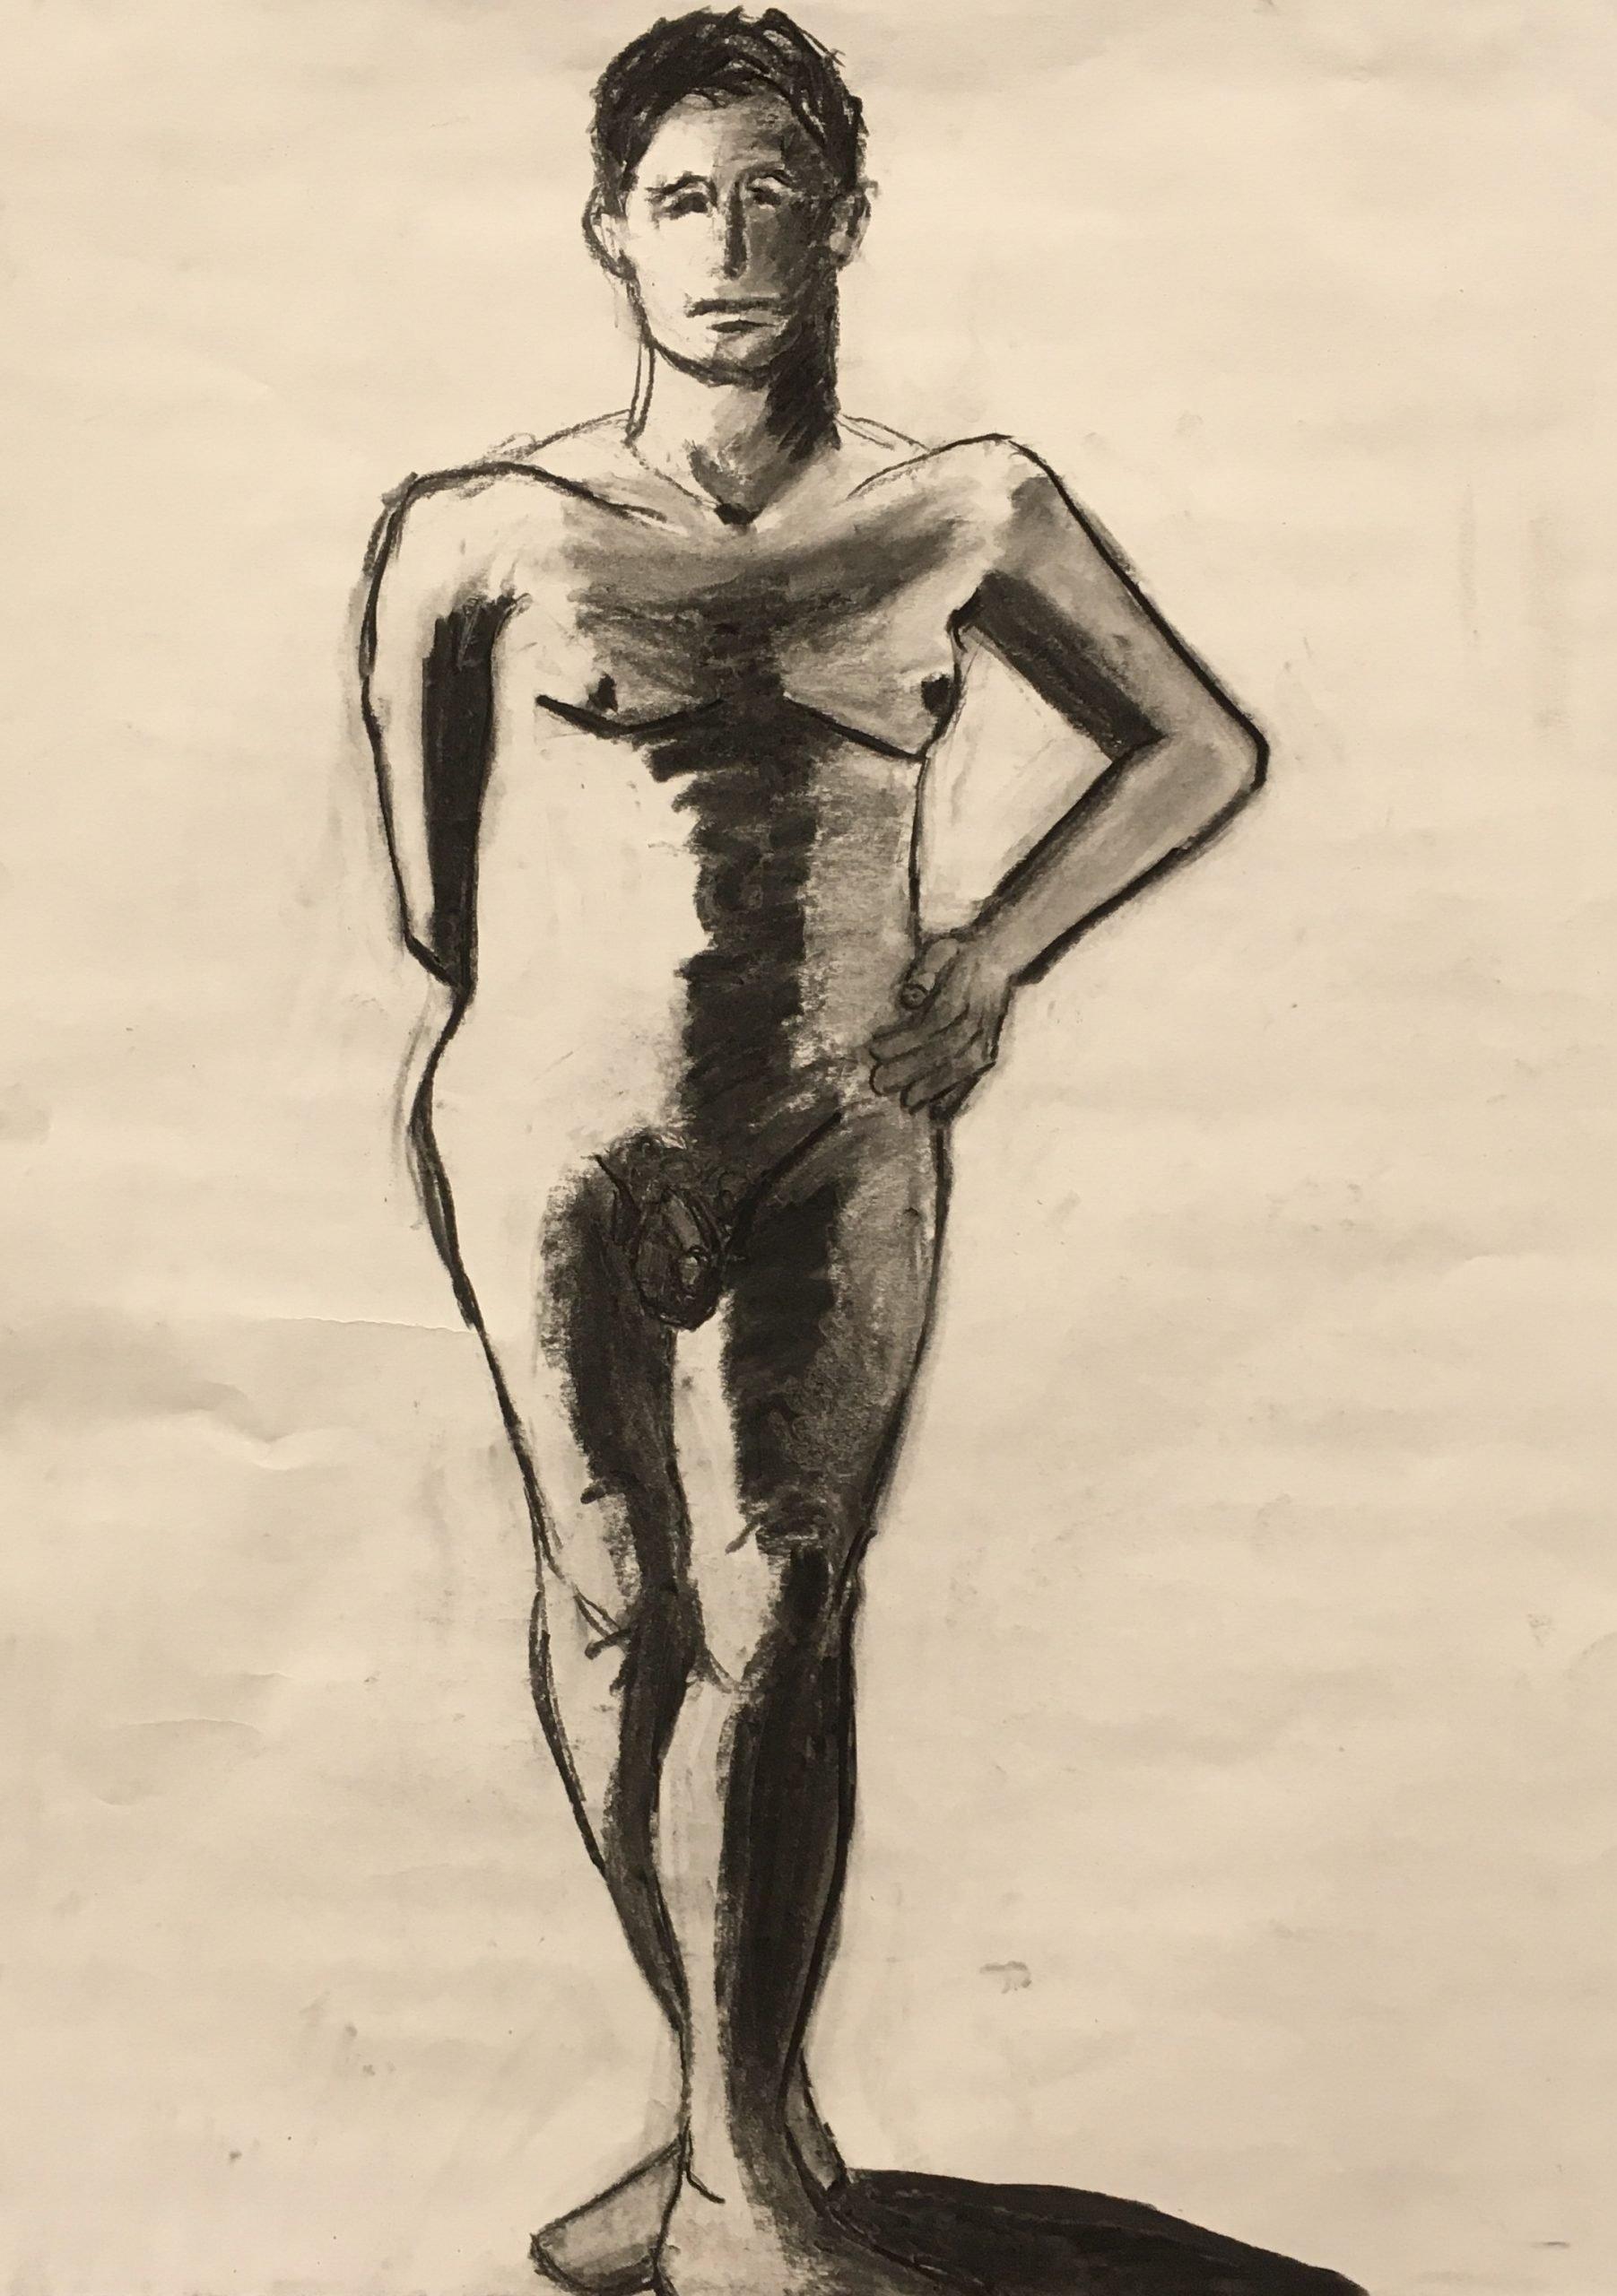 Jan Corash, man standing at Waltham Open Studios. 2021